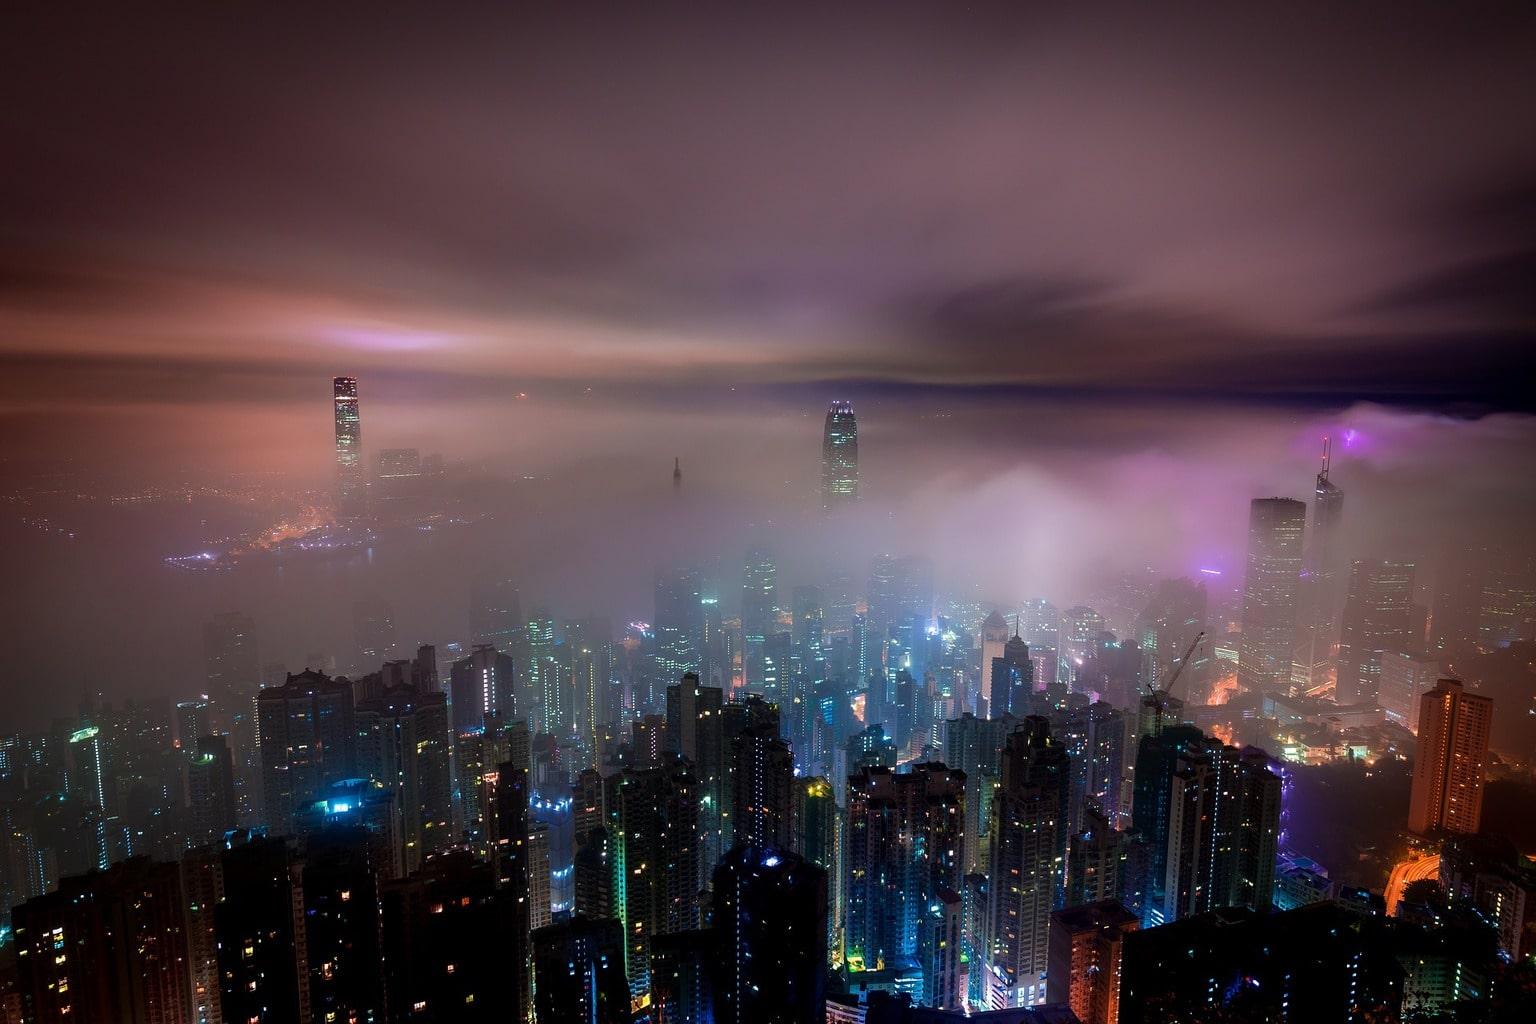 Fotografía nocturna de nubes en Hong Kong